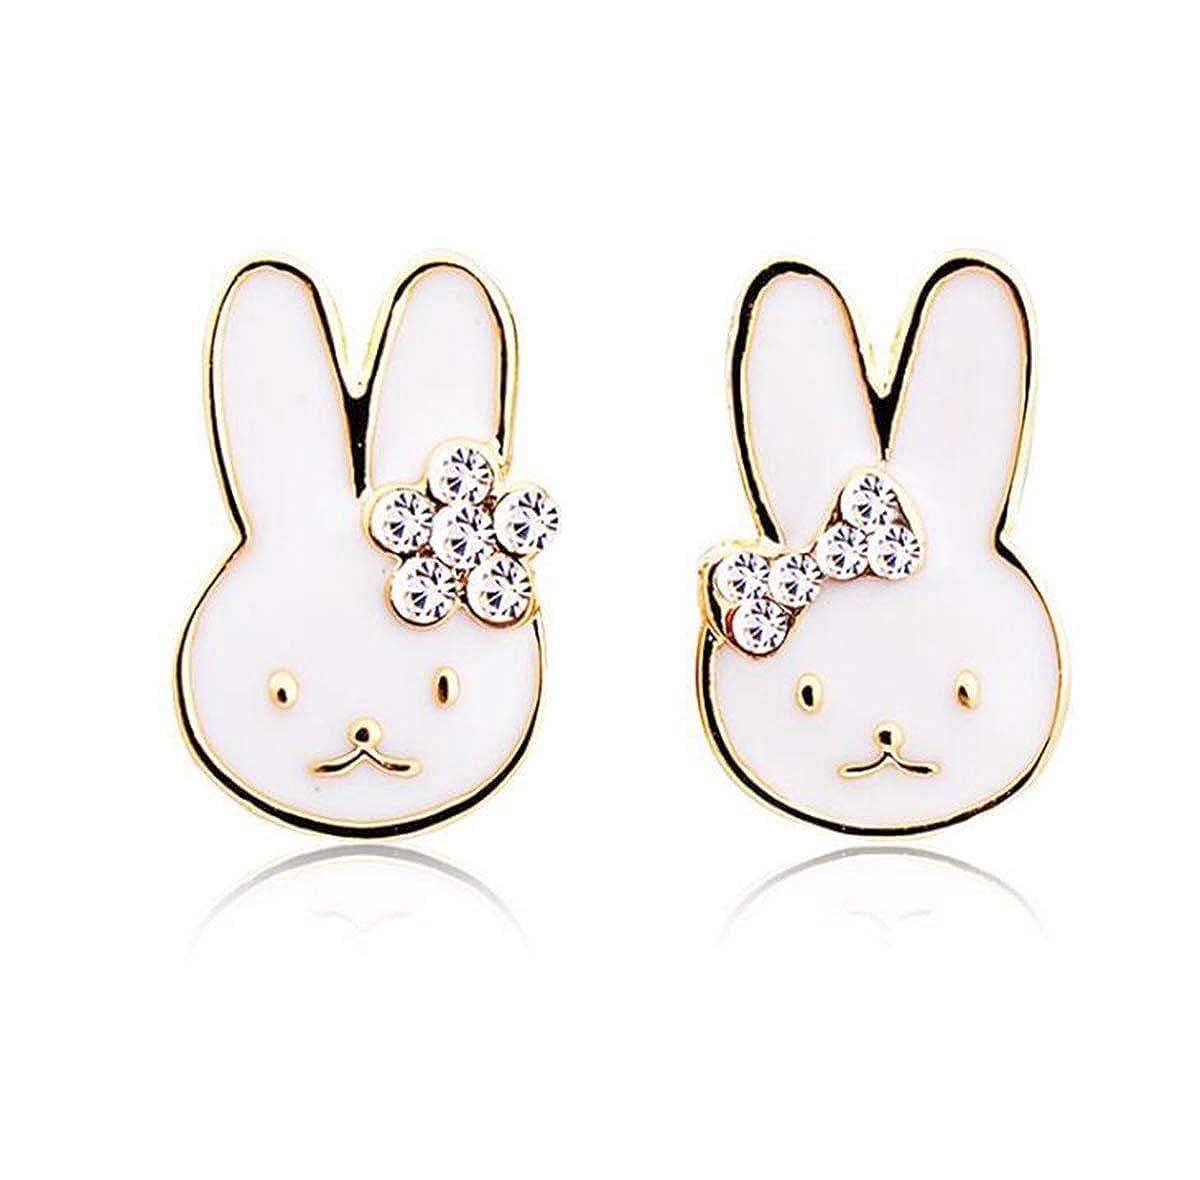 Libaraba Diamond Accent Rabbit with Bowknot Stud Earrings with Heart Jewelry Box,Rabbit Earrings for Women